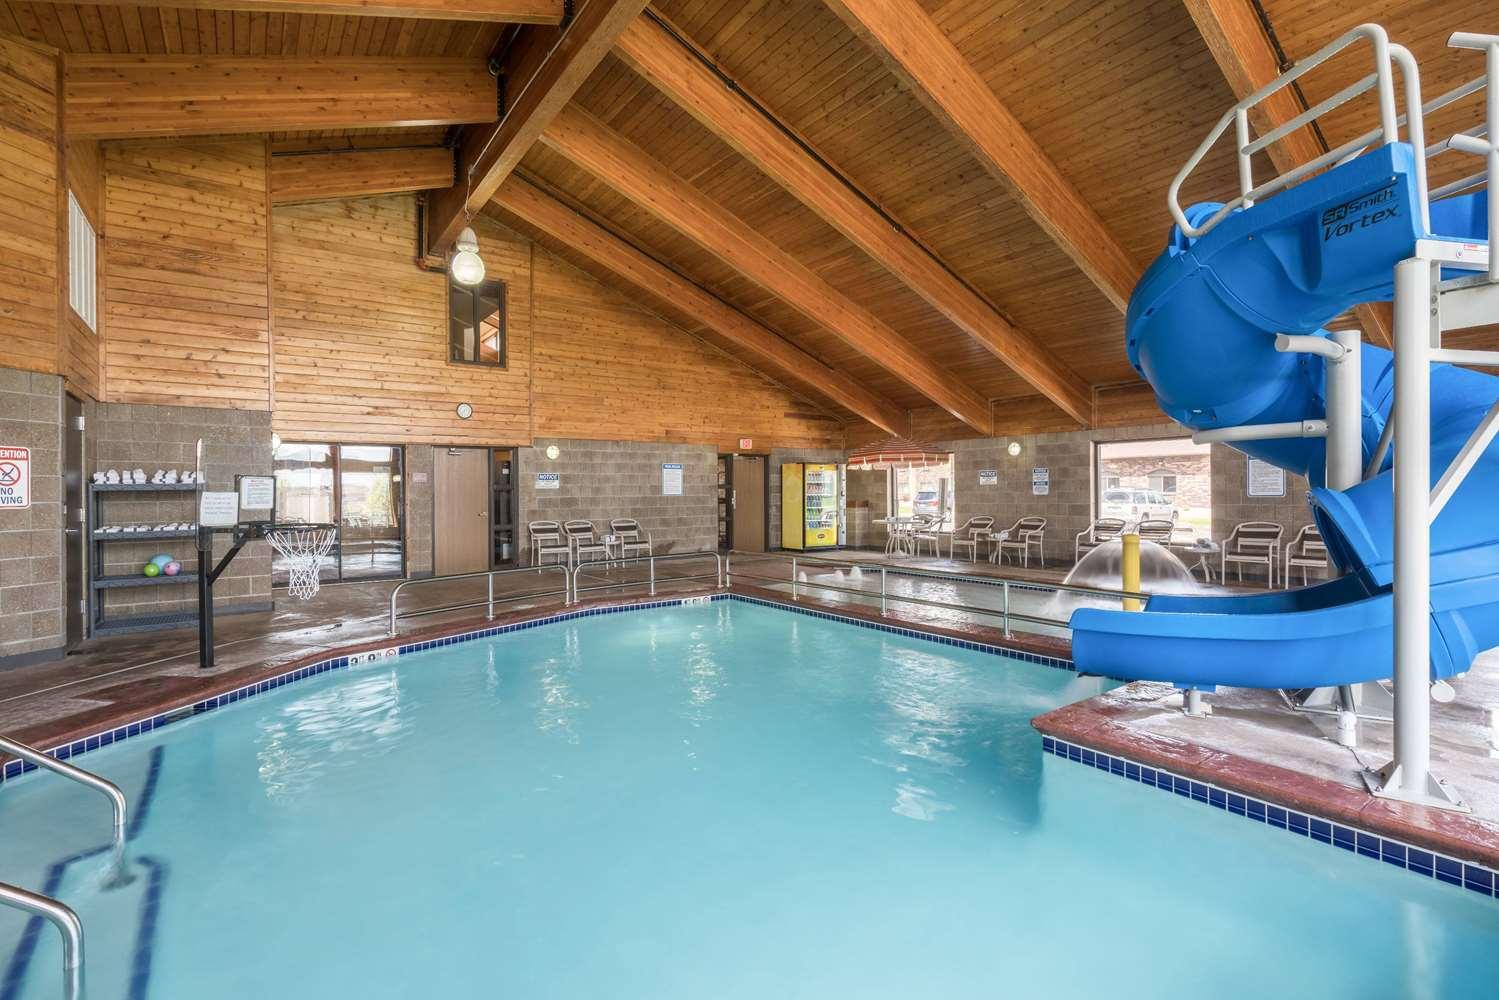 Pool - AmericInn Lodge & Suites West Acres Fargo